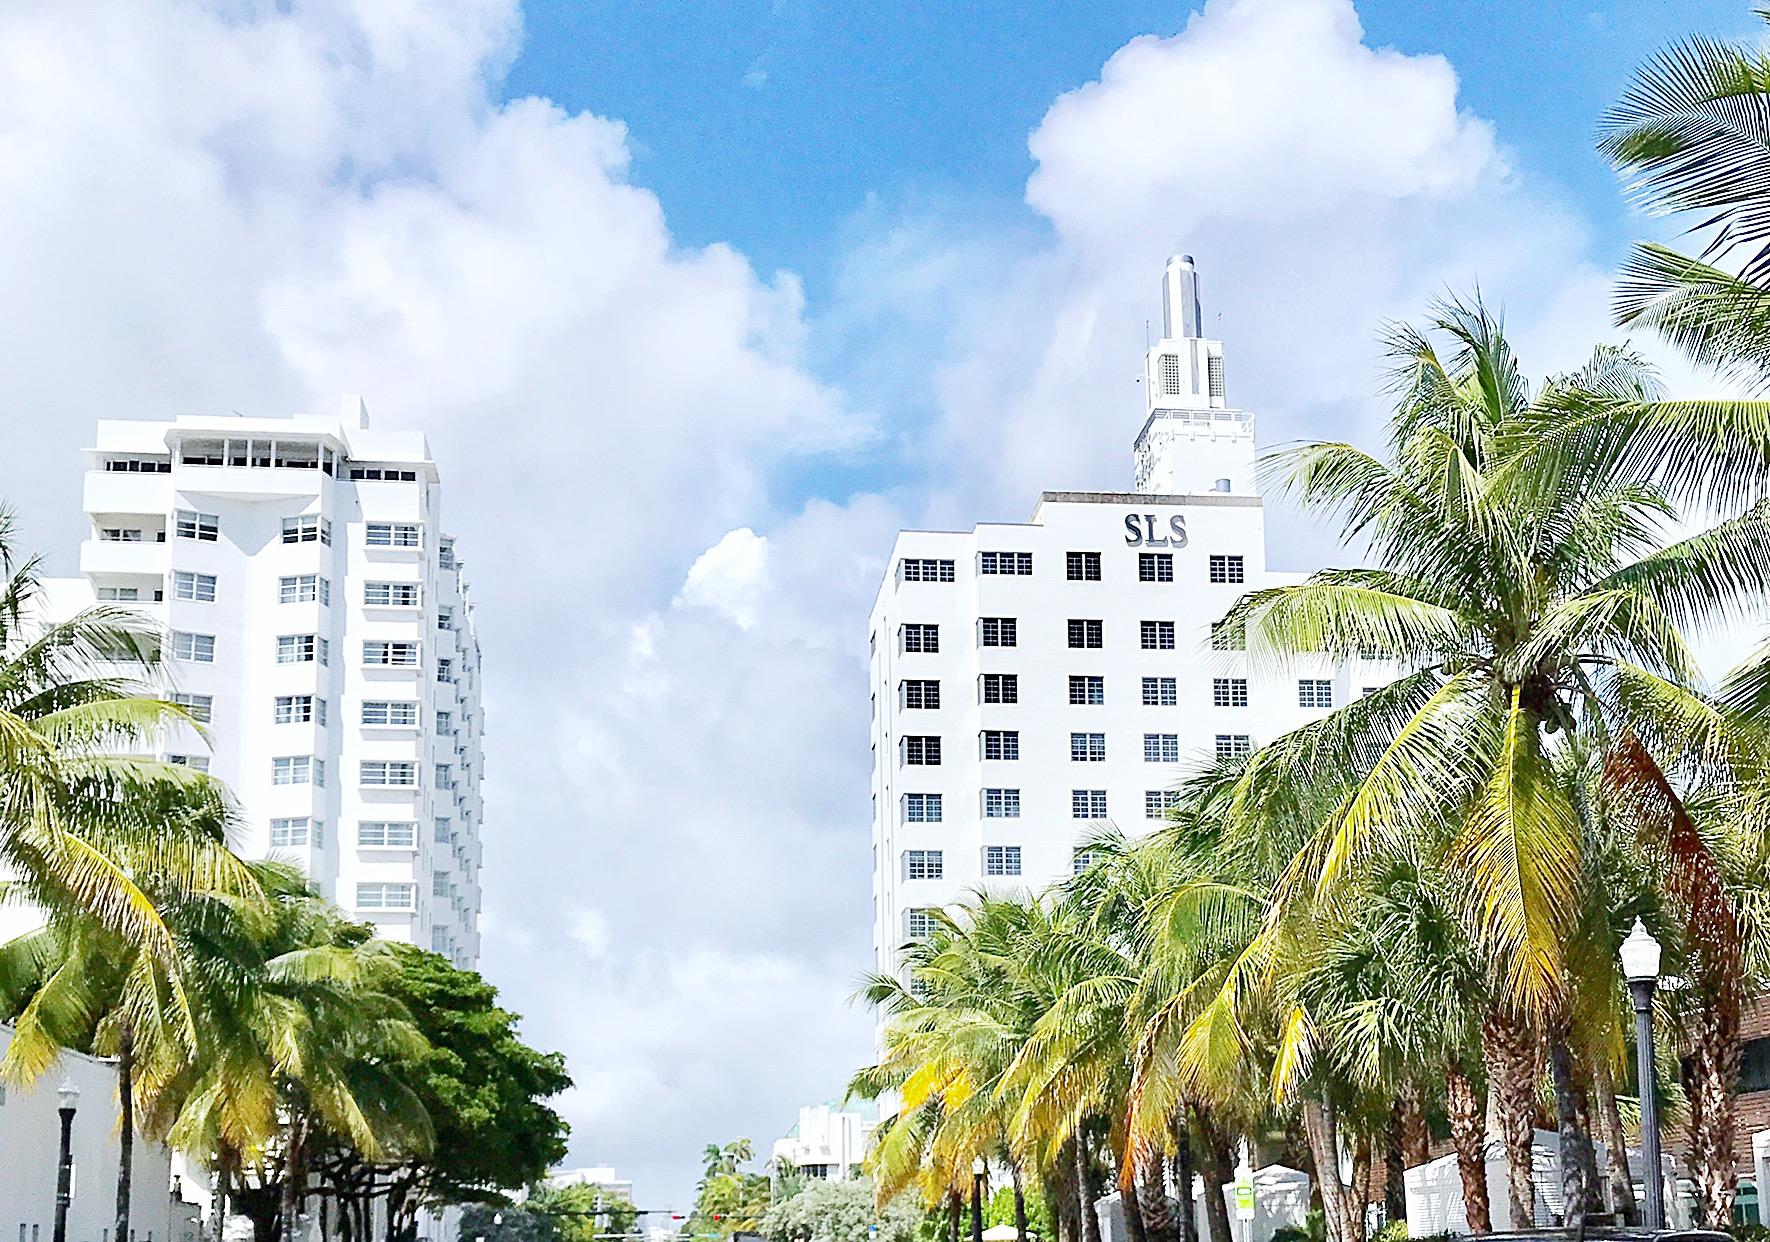 SLS Hotel South Beach, Girls getaway guide,south beach Miami, south beach boutique hotel